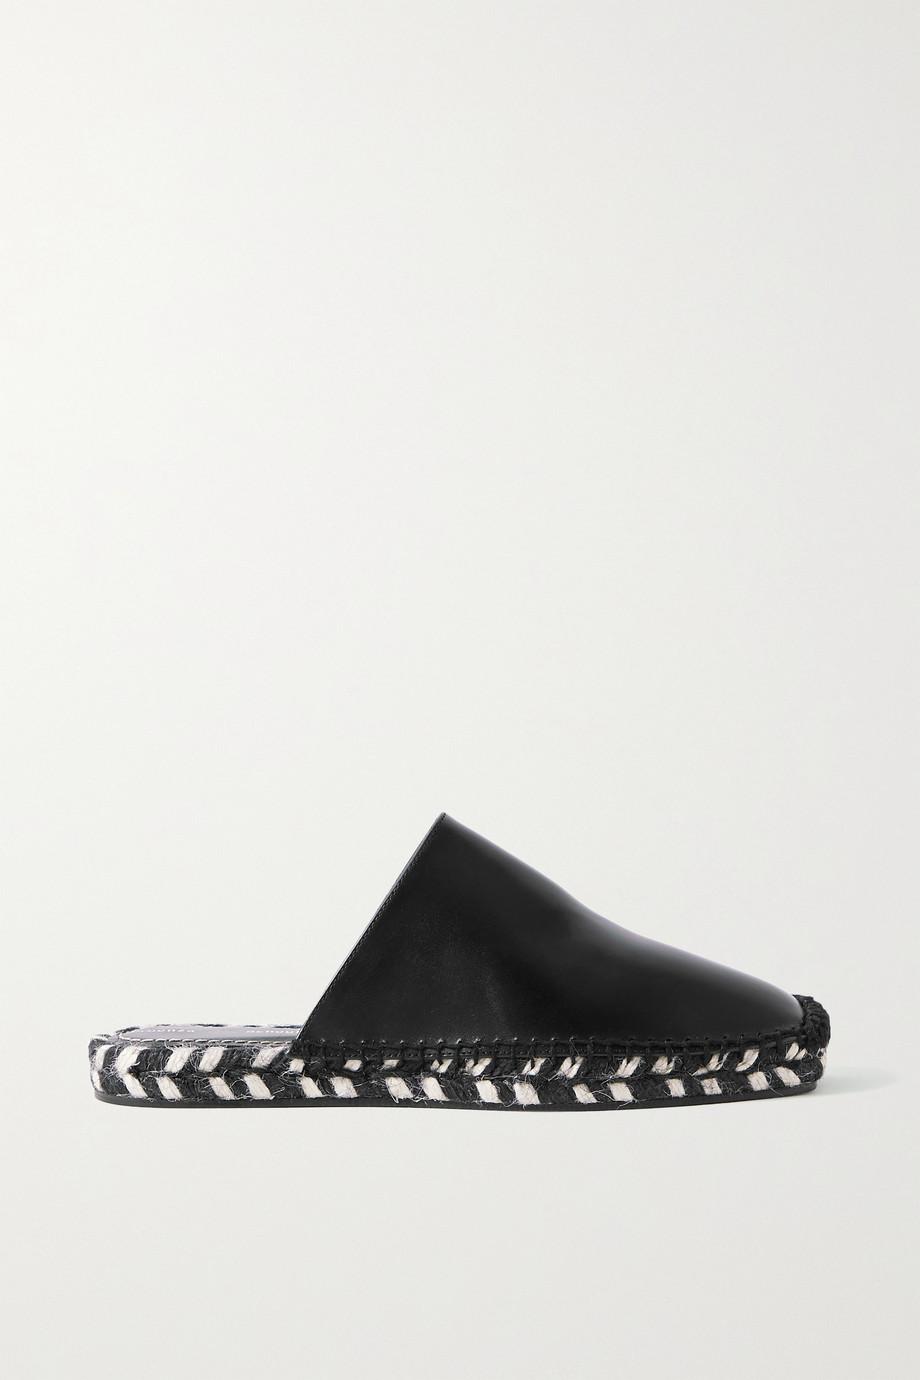 Proenza Schouler Leather espadrille slippers